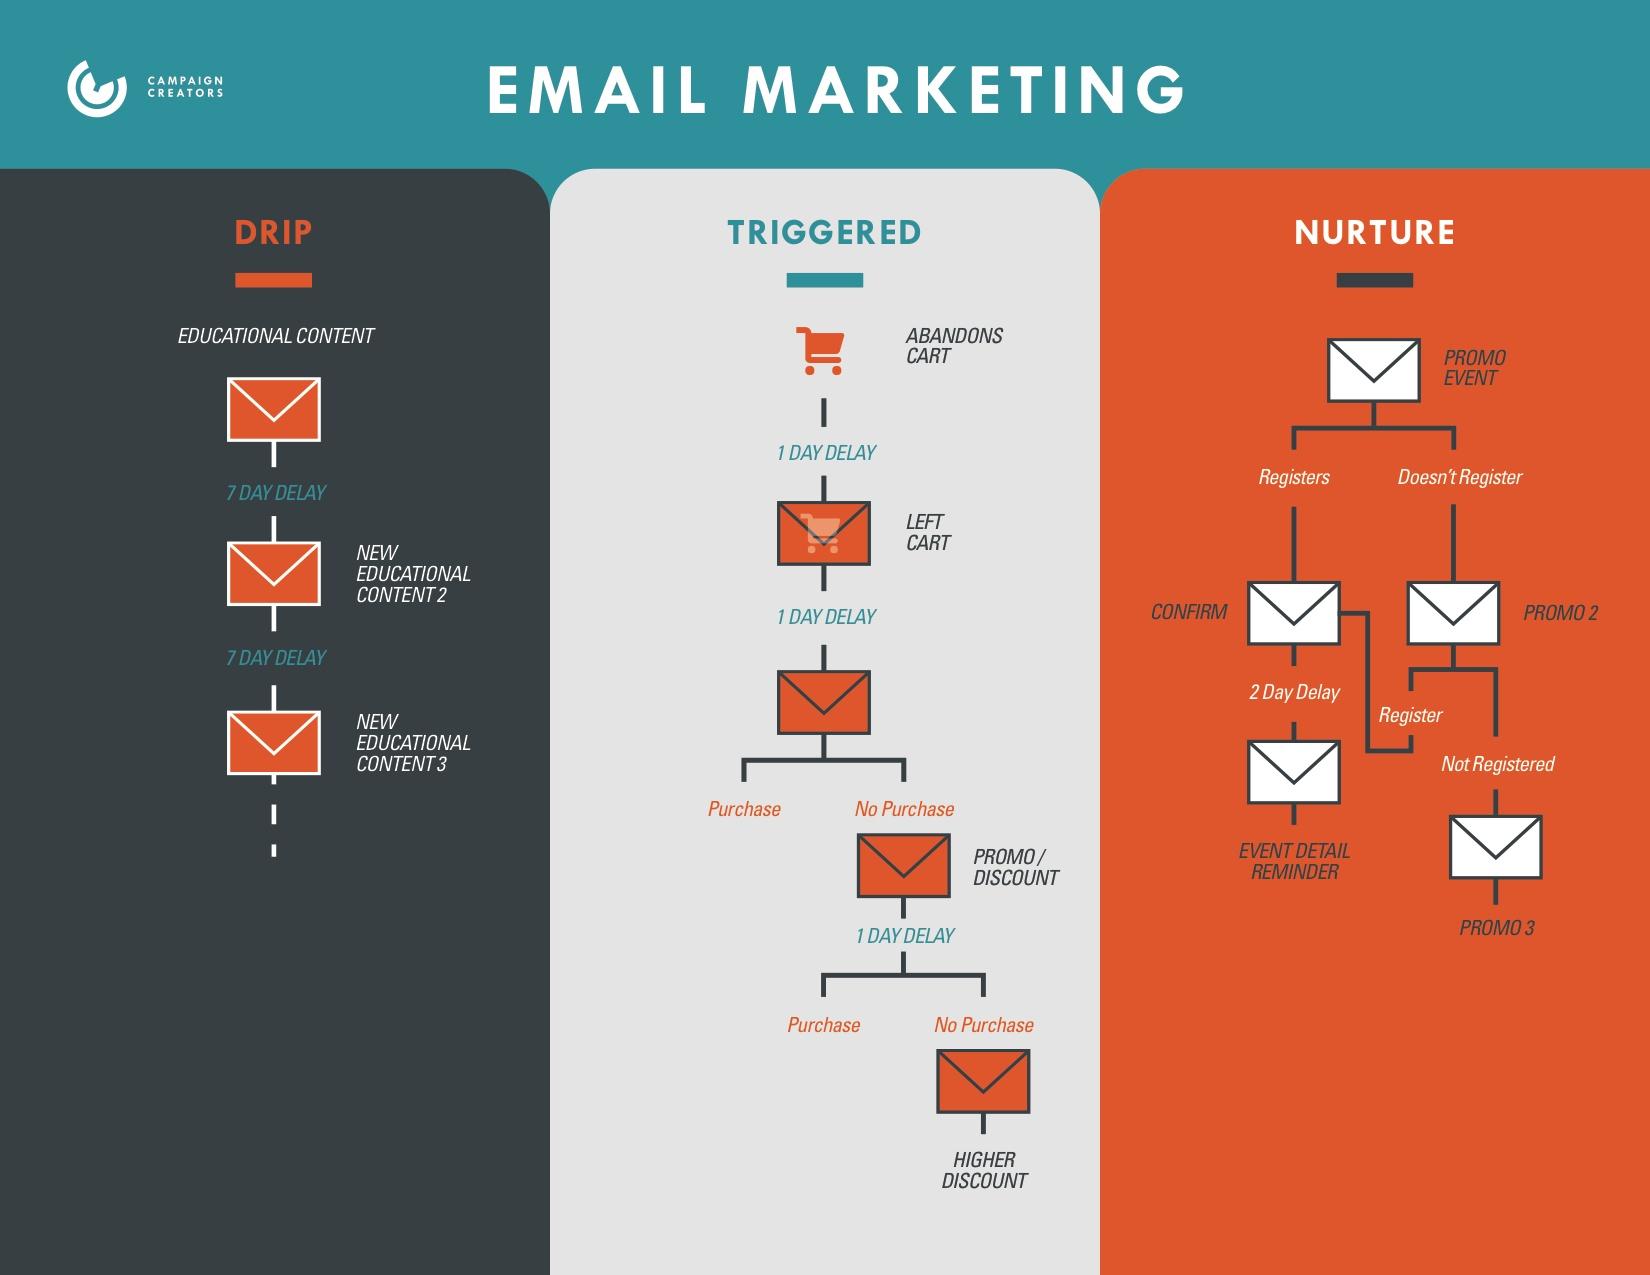 CampaignCreators-Email-Marketing-Diagram-1